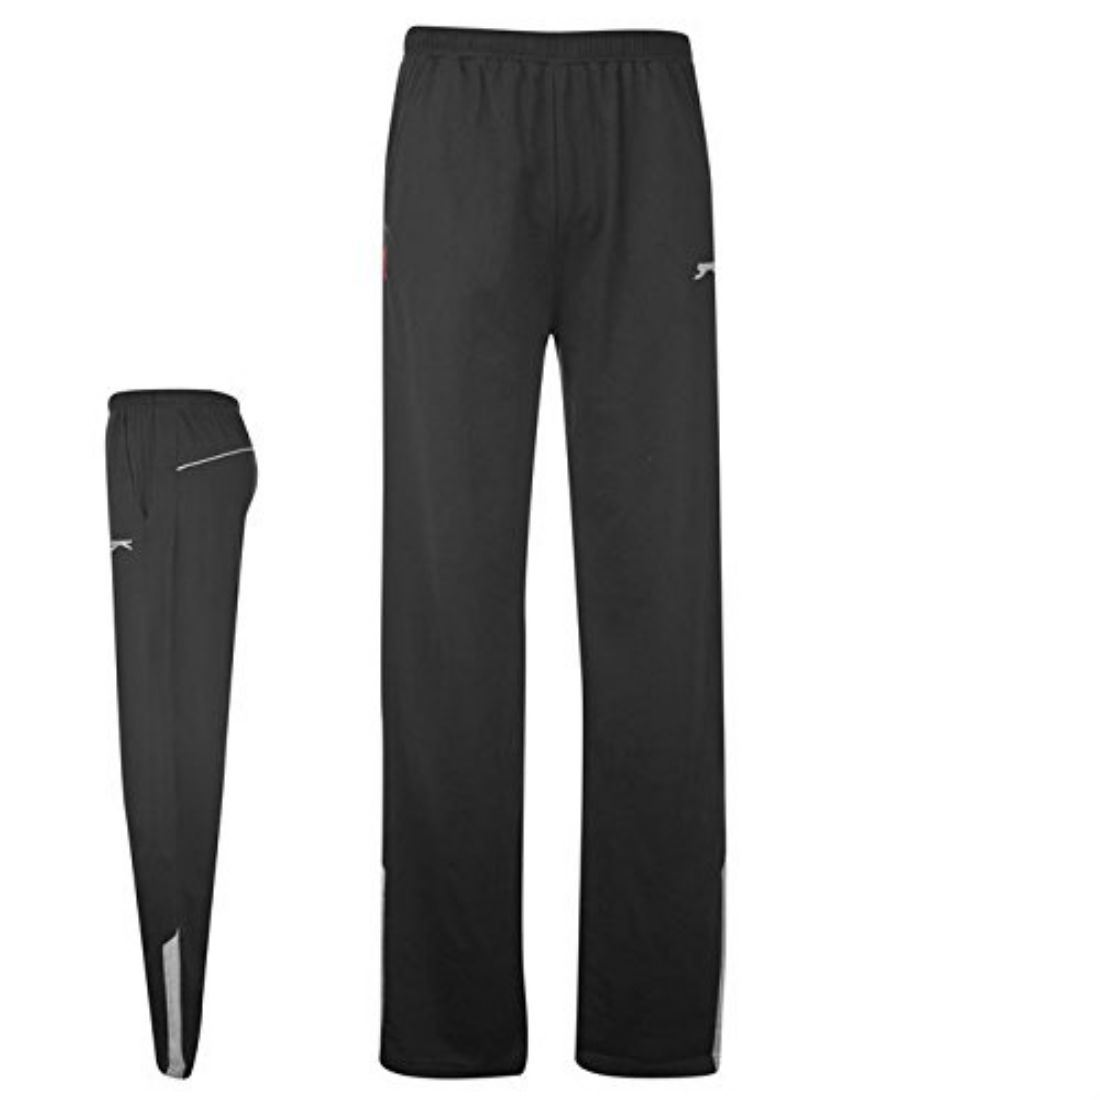 Slazenger Mens Jersey Pants Jogging Pants Sports Tracksuit Bottoms Trousers